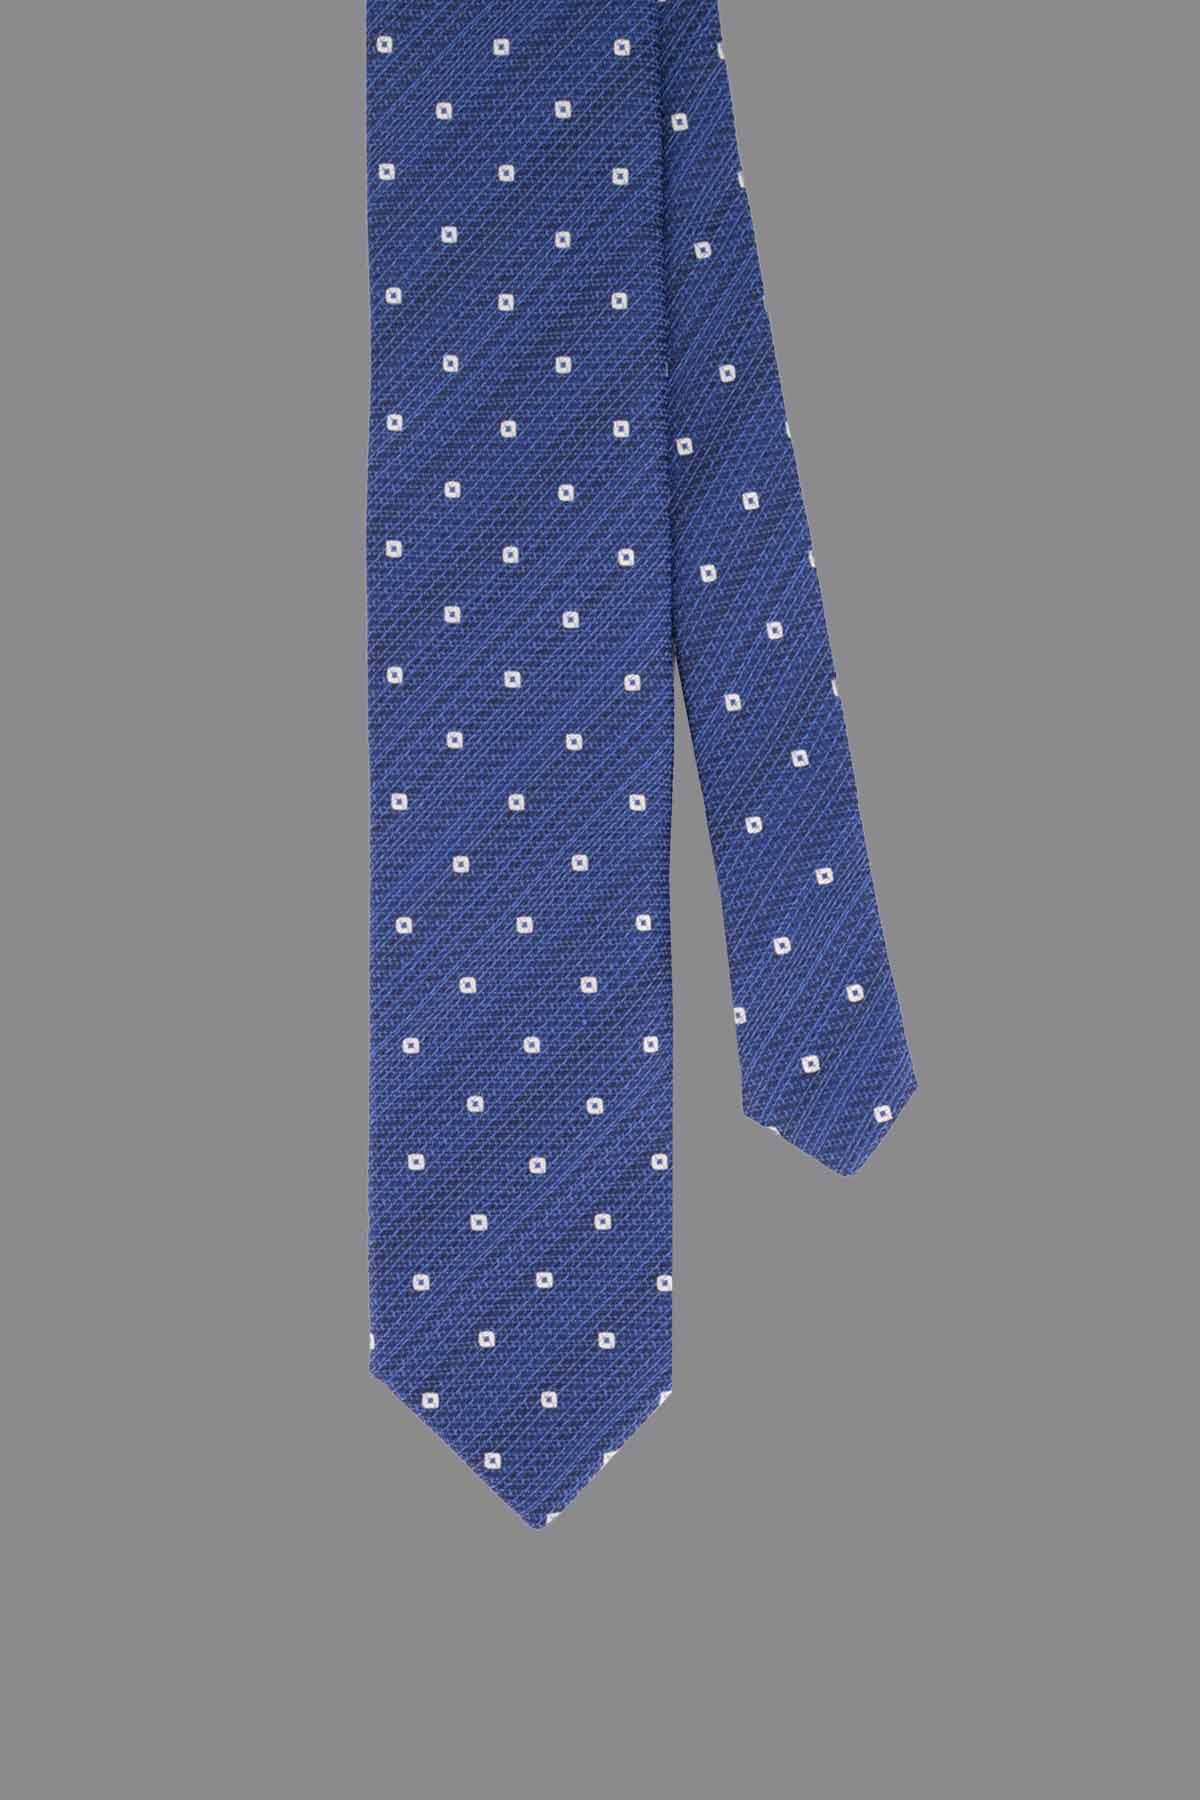 Corbata CANALI color Azúl